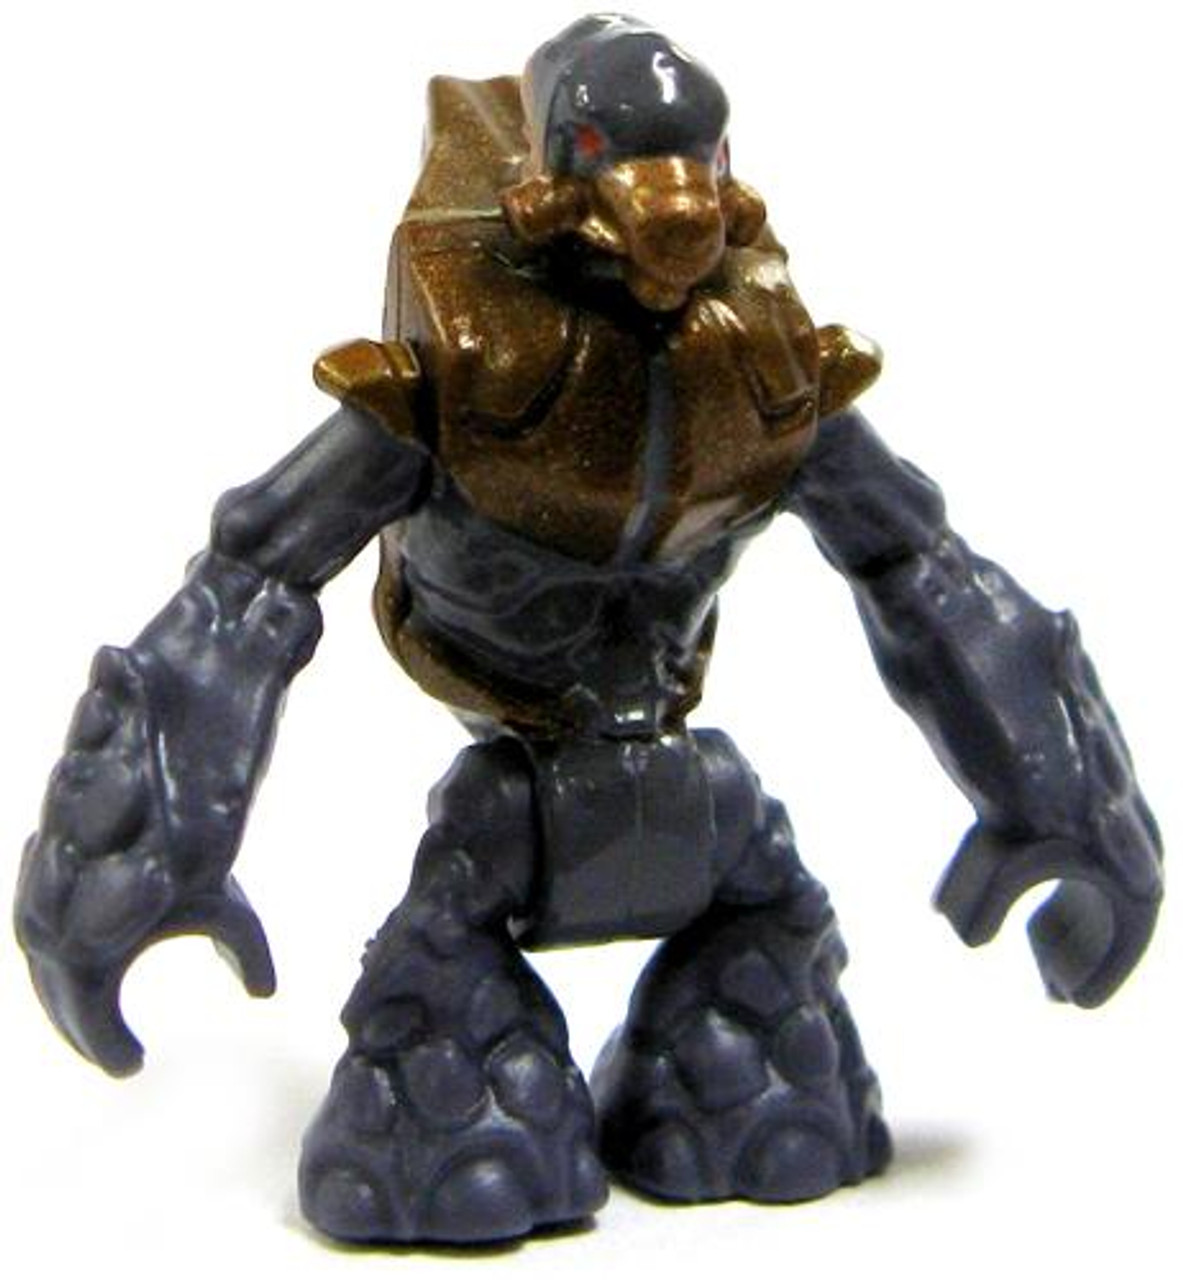 Mega Bloks Halo Loose Grunt Minifigure [Copper Loose]